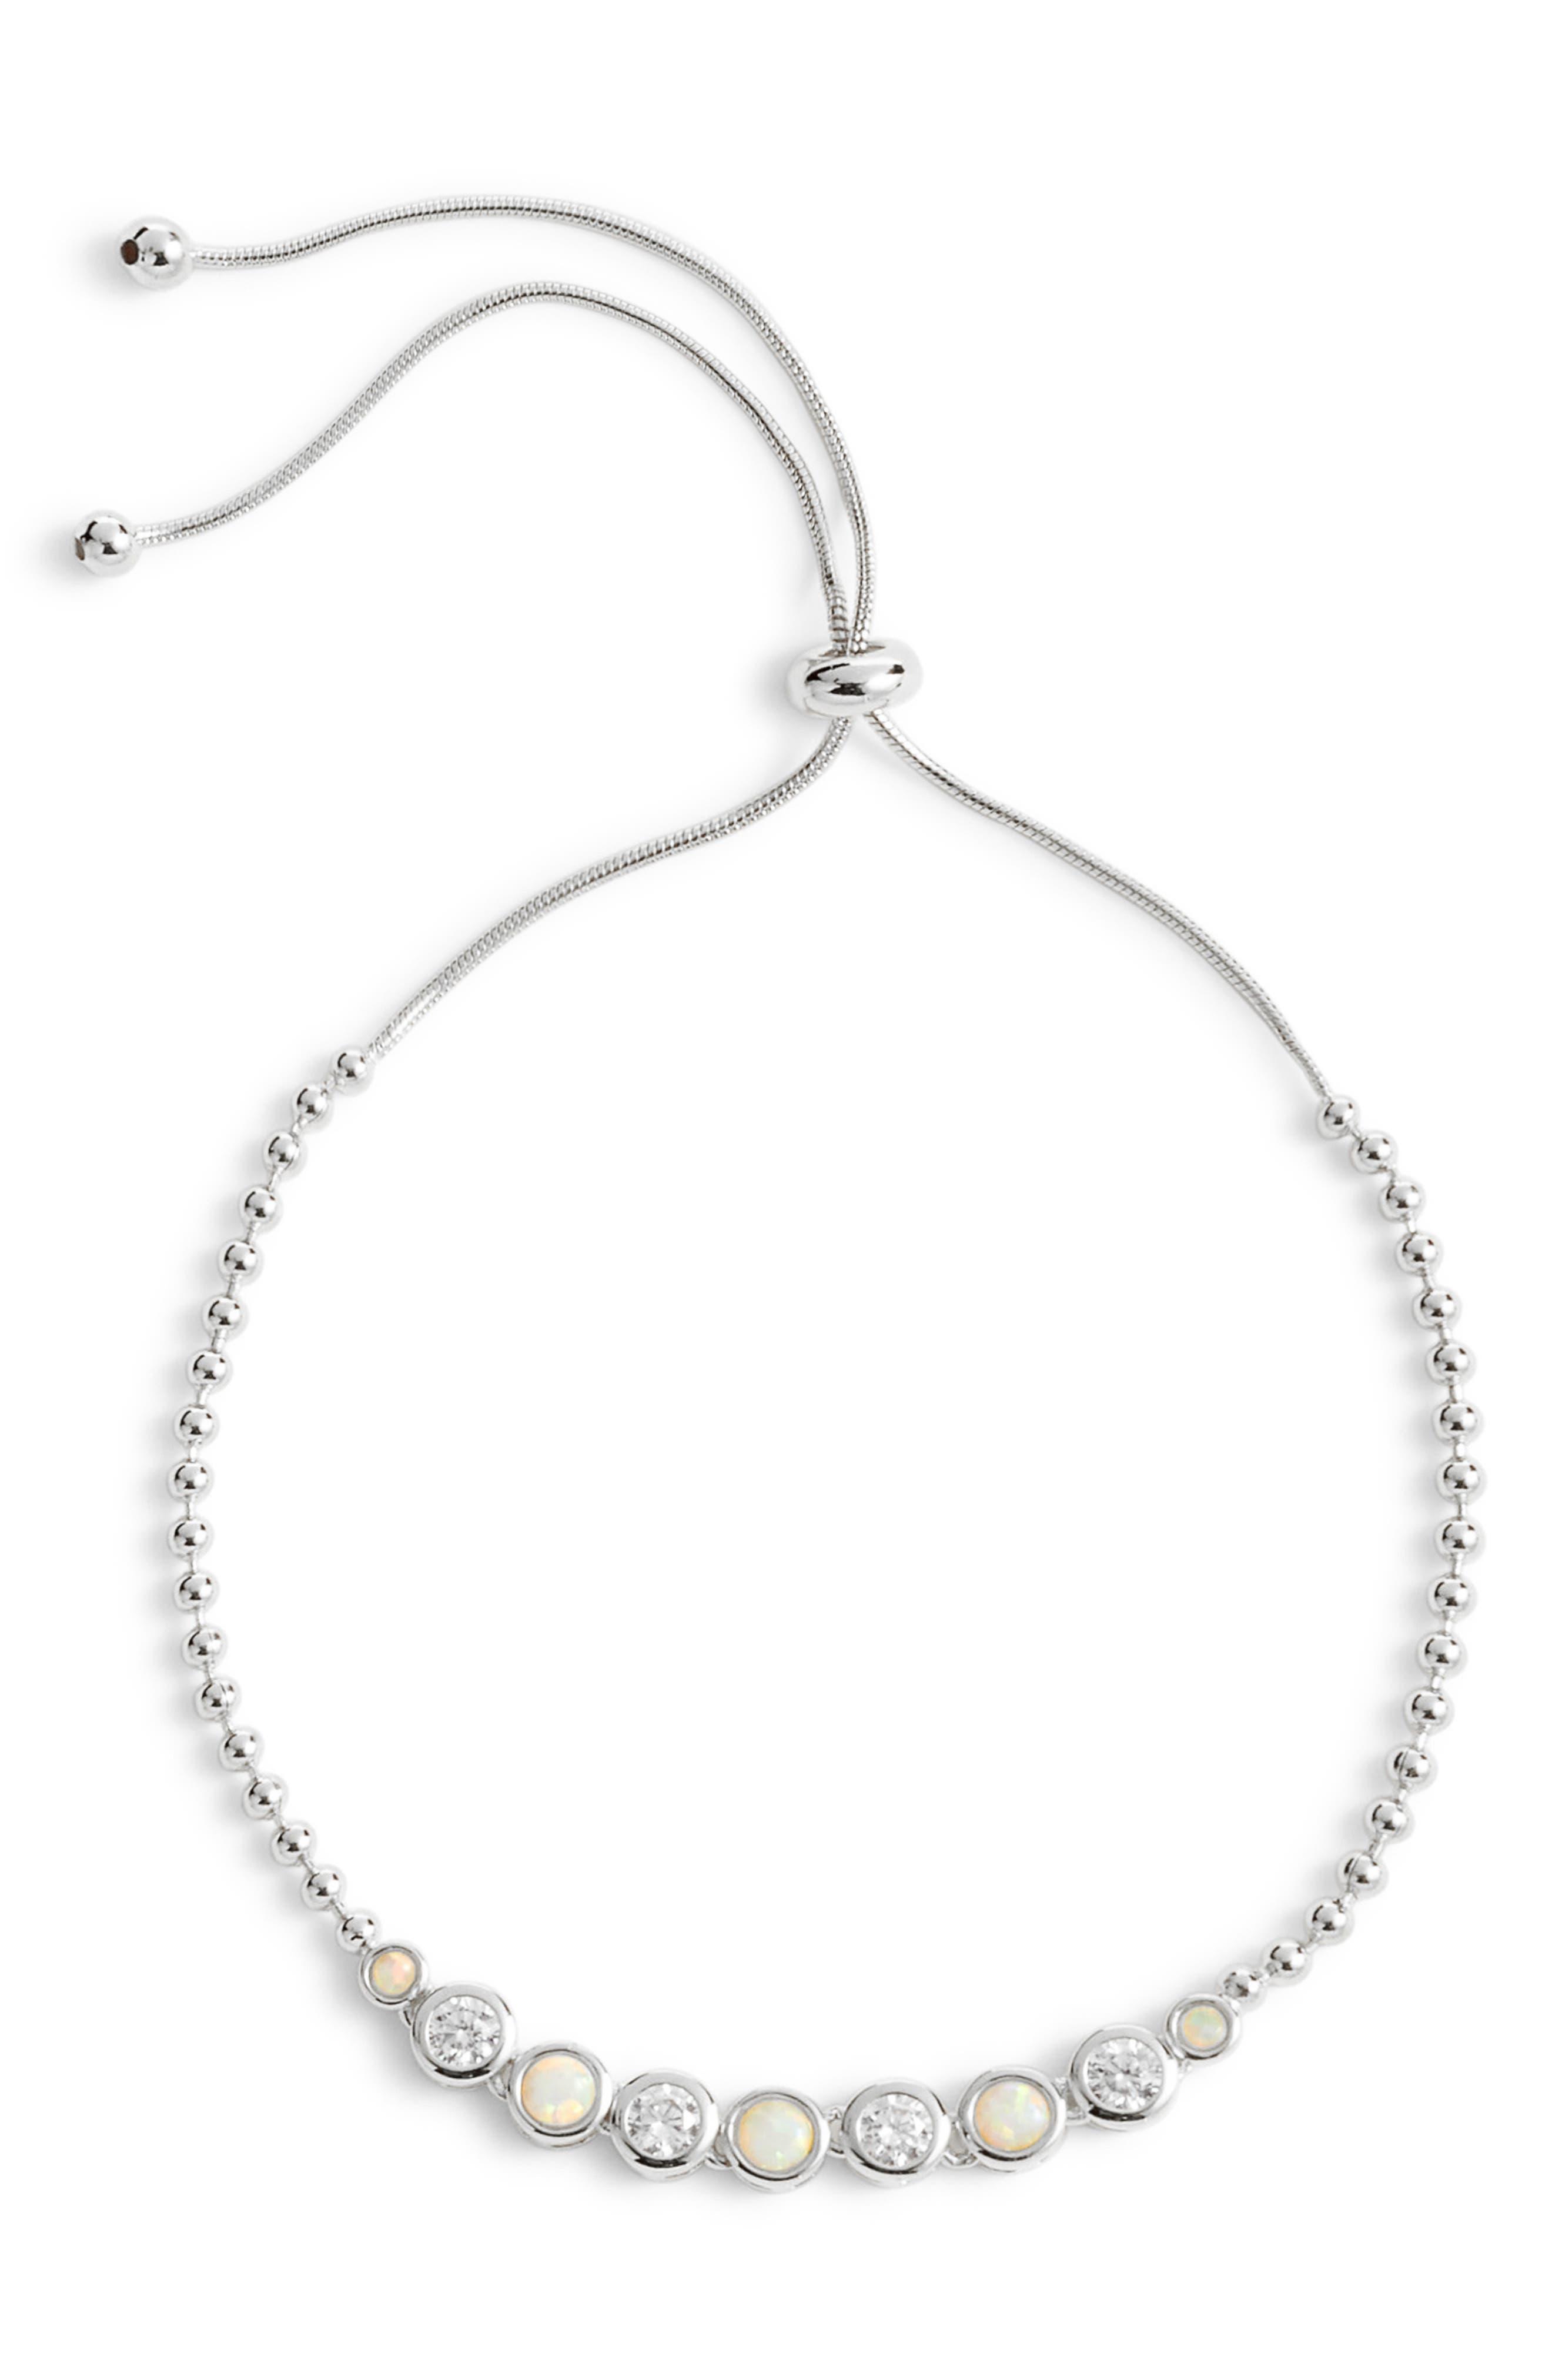 Opal Adjustable Bracelet,                             Main thumbnail 1, color,                             OPAL/ SILVER